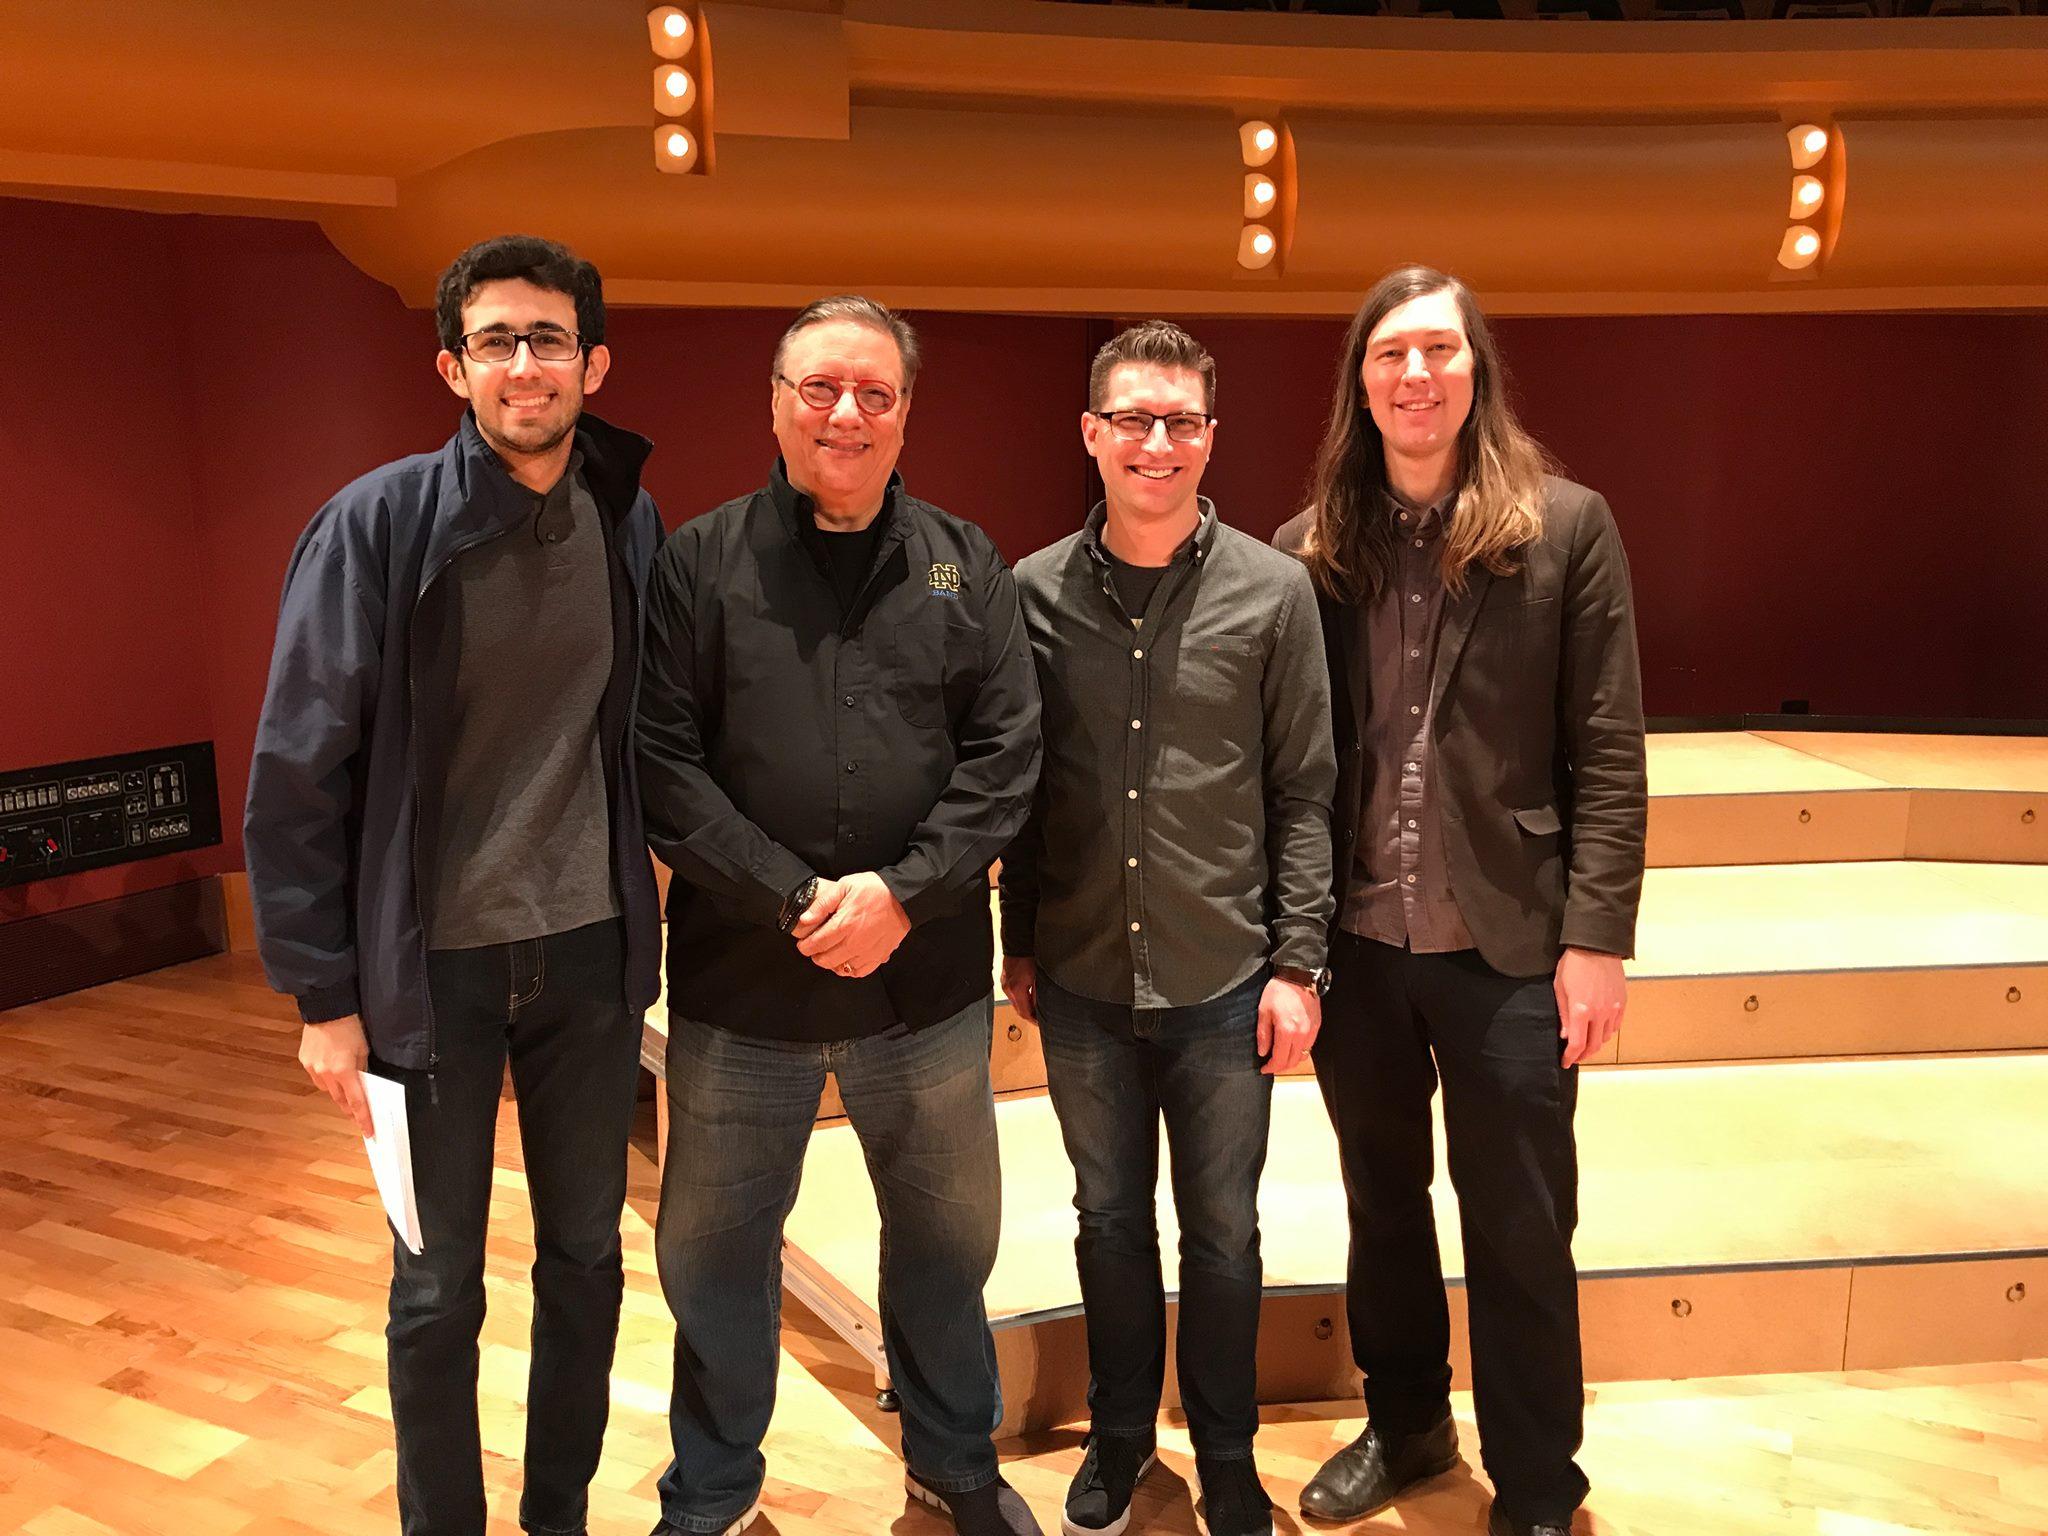 Pictured with Arturo Sandoval (trumpet), Jon Deitemyer (drums) and Matt Ulery (bass).